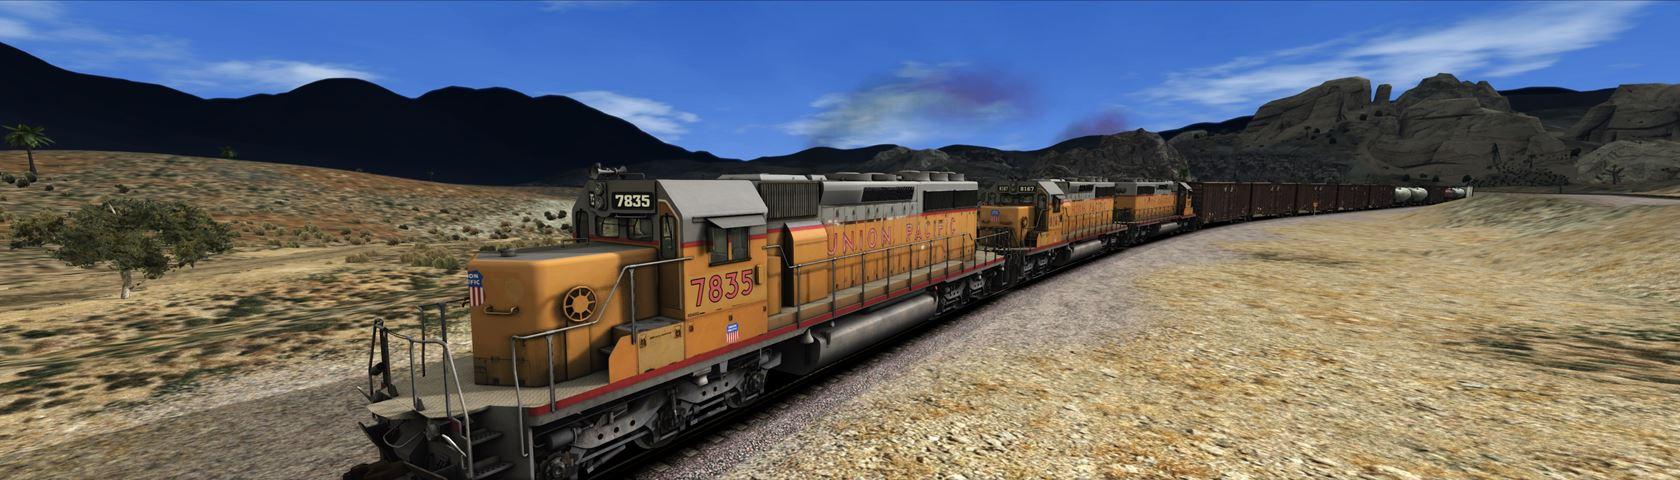 TS2021